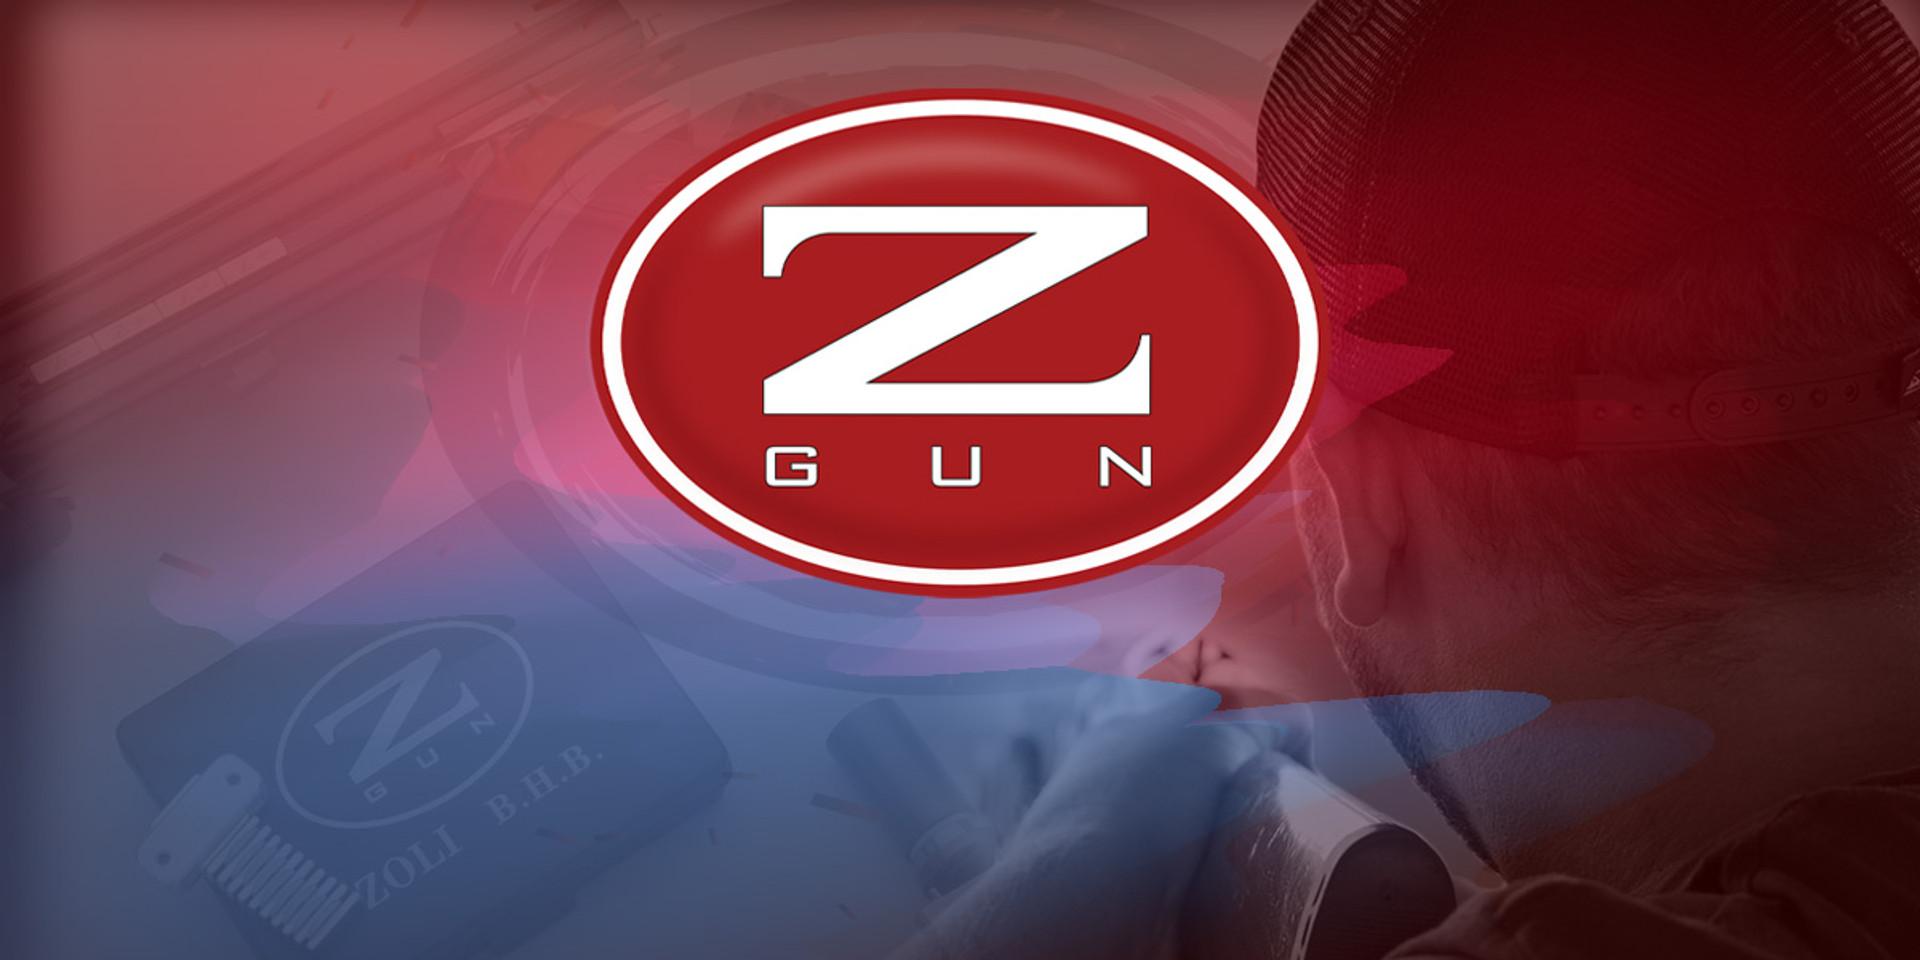 Zoli Shotguns - Z Gun